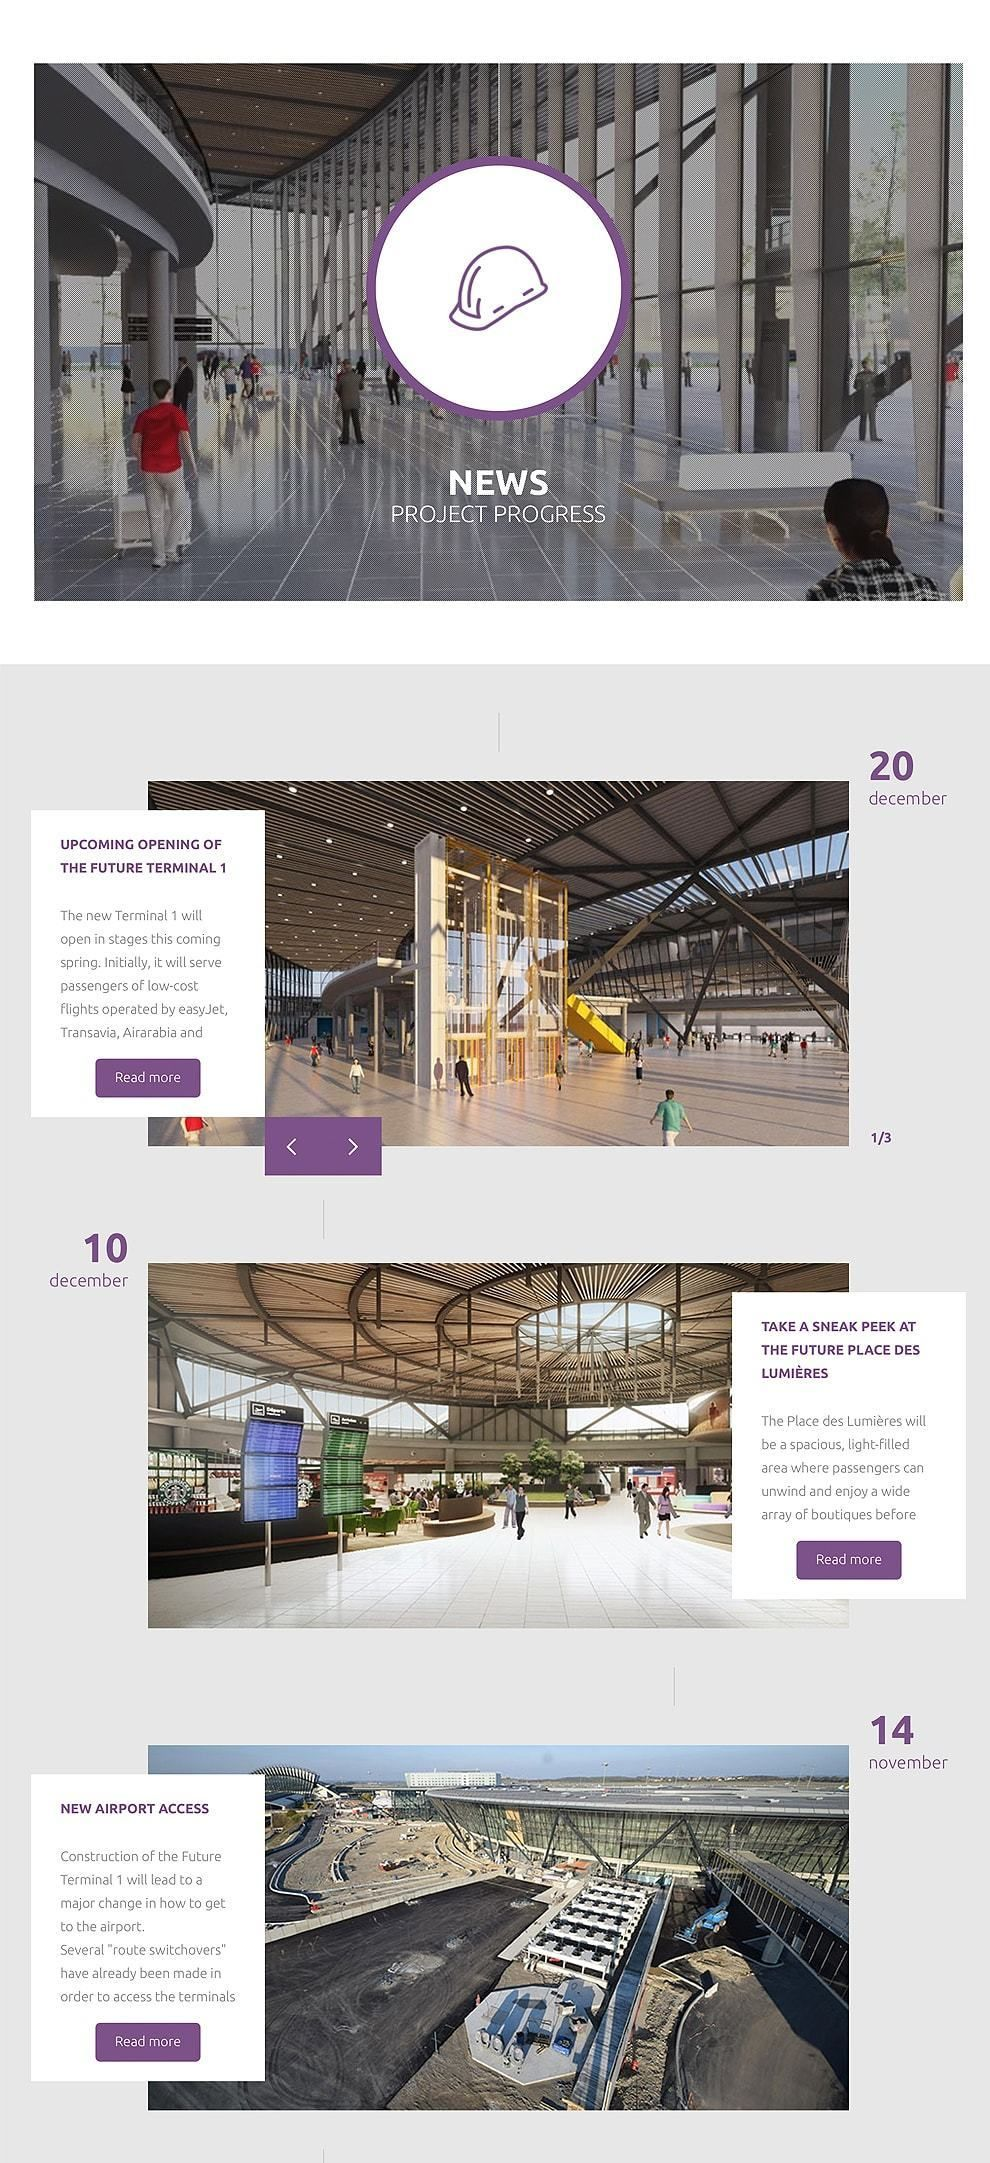 Lyon-Saint Exupery Airport Amazing Website